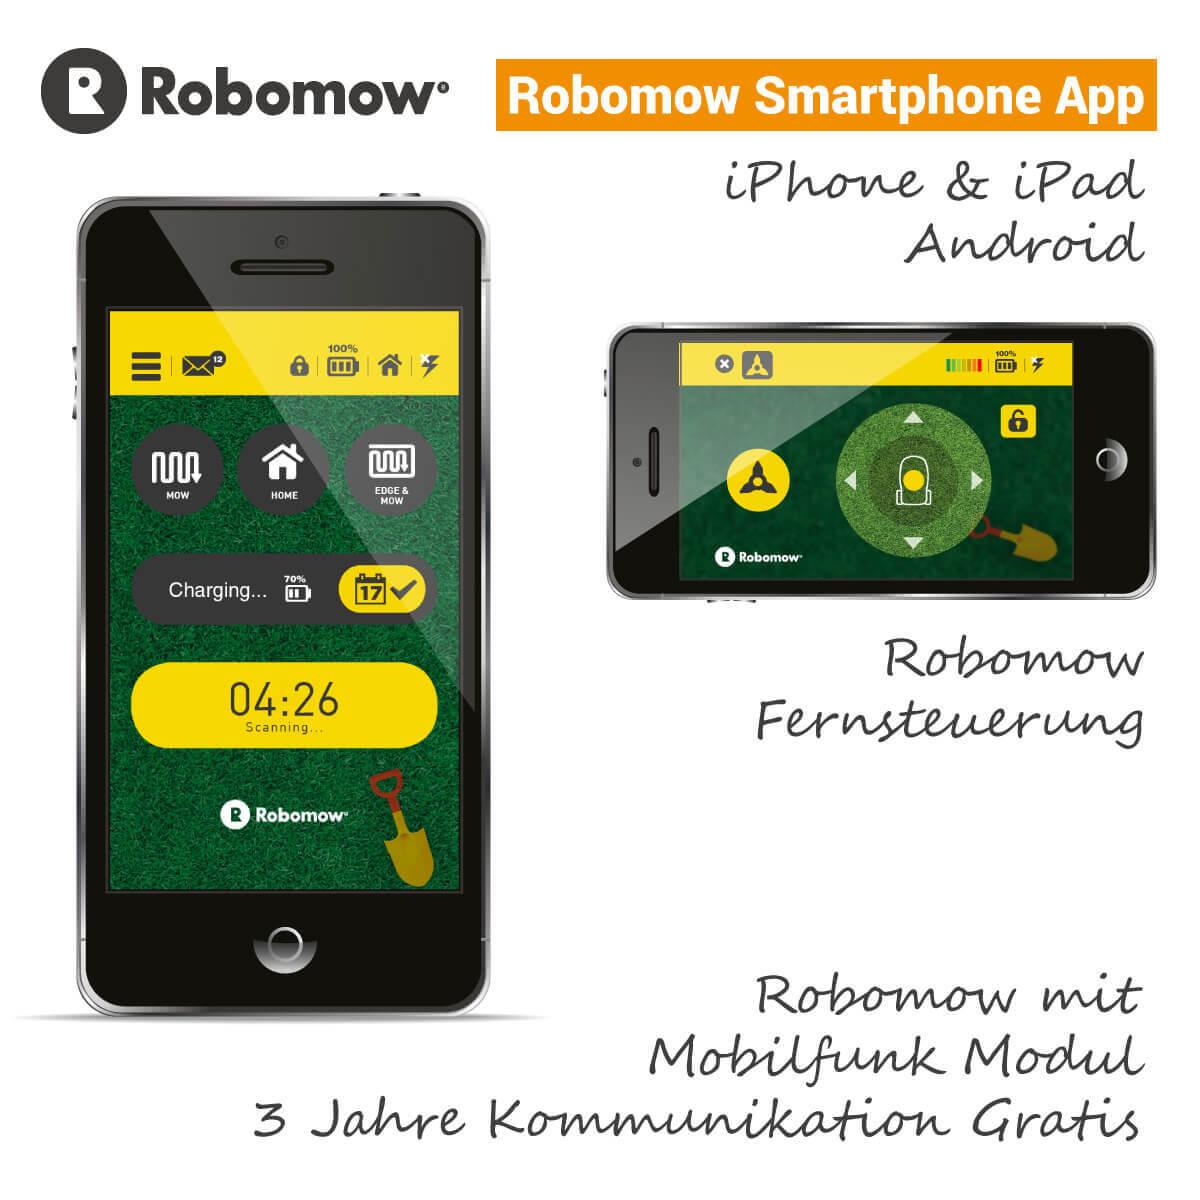 robomow rc 312 pro s rasenroboter mit robohome g nstig kaufen. Black Bedroom Furniture Sets. Home Design Ideas